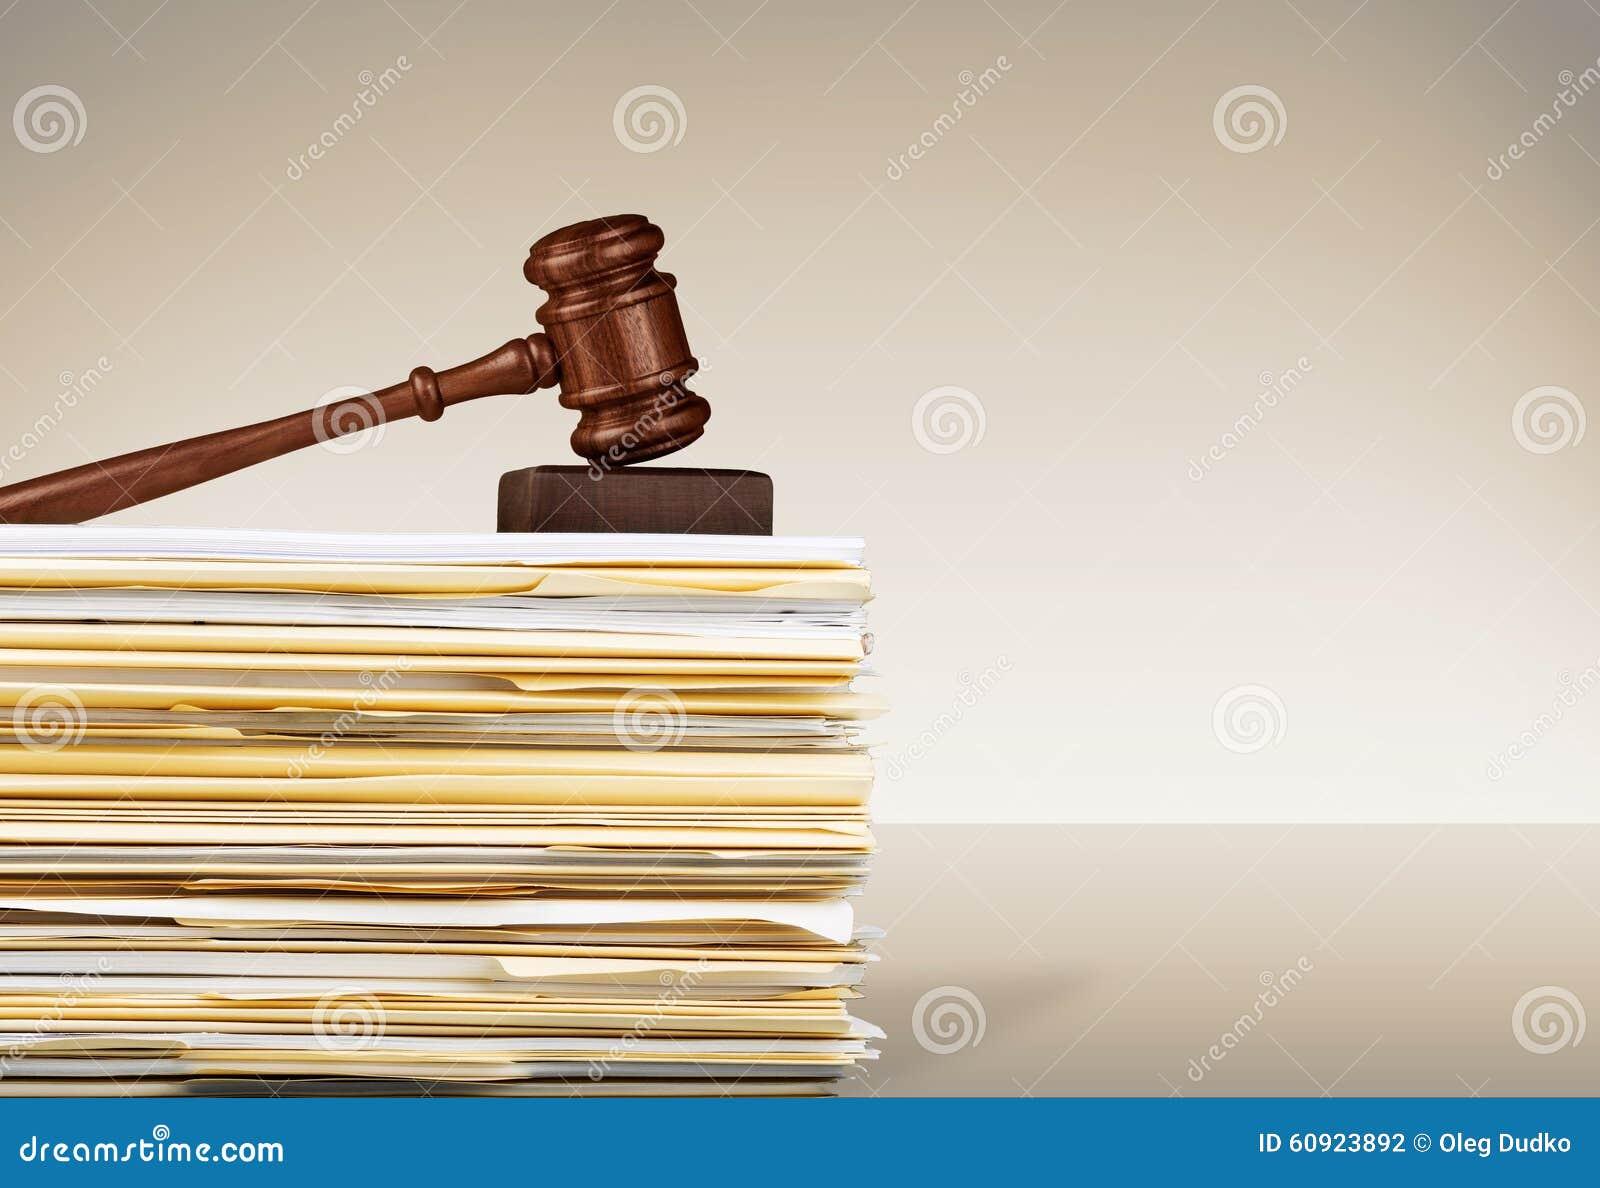 Legislation Documents Stock Photo Image Of Paperwork - Law documents